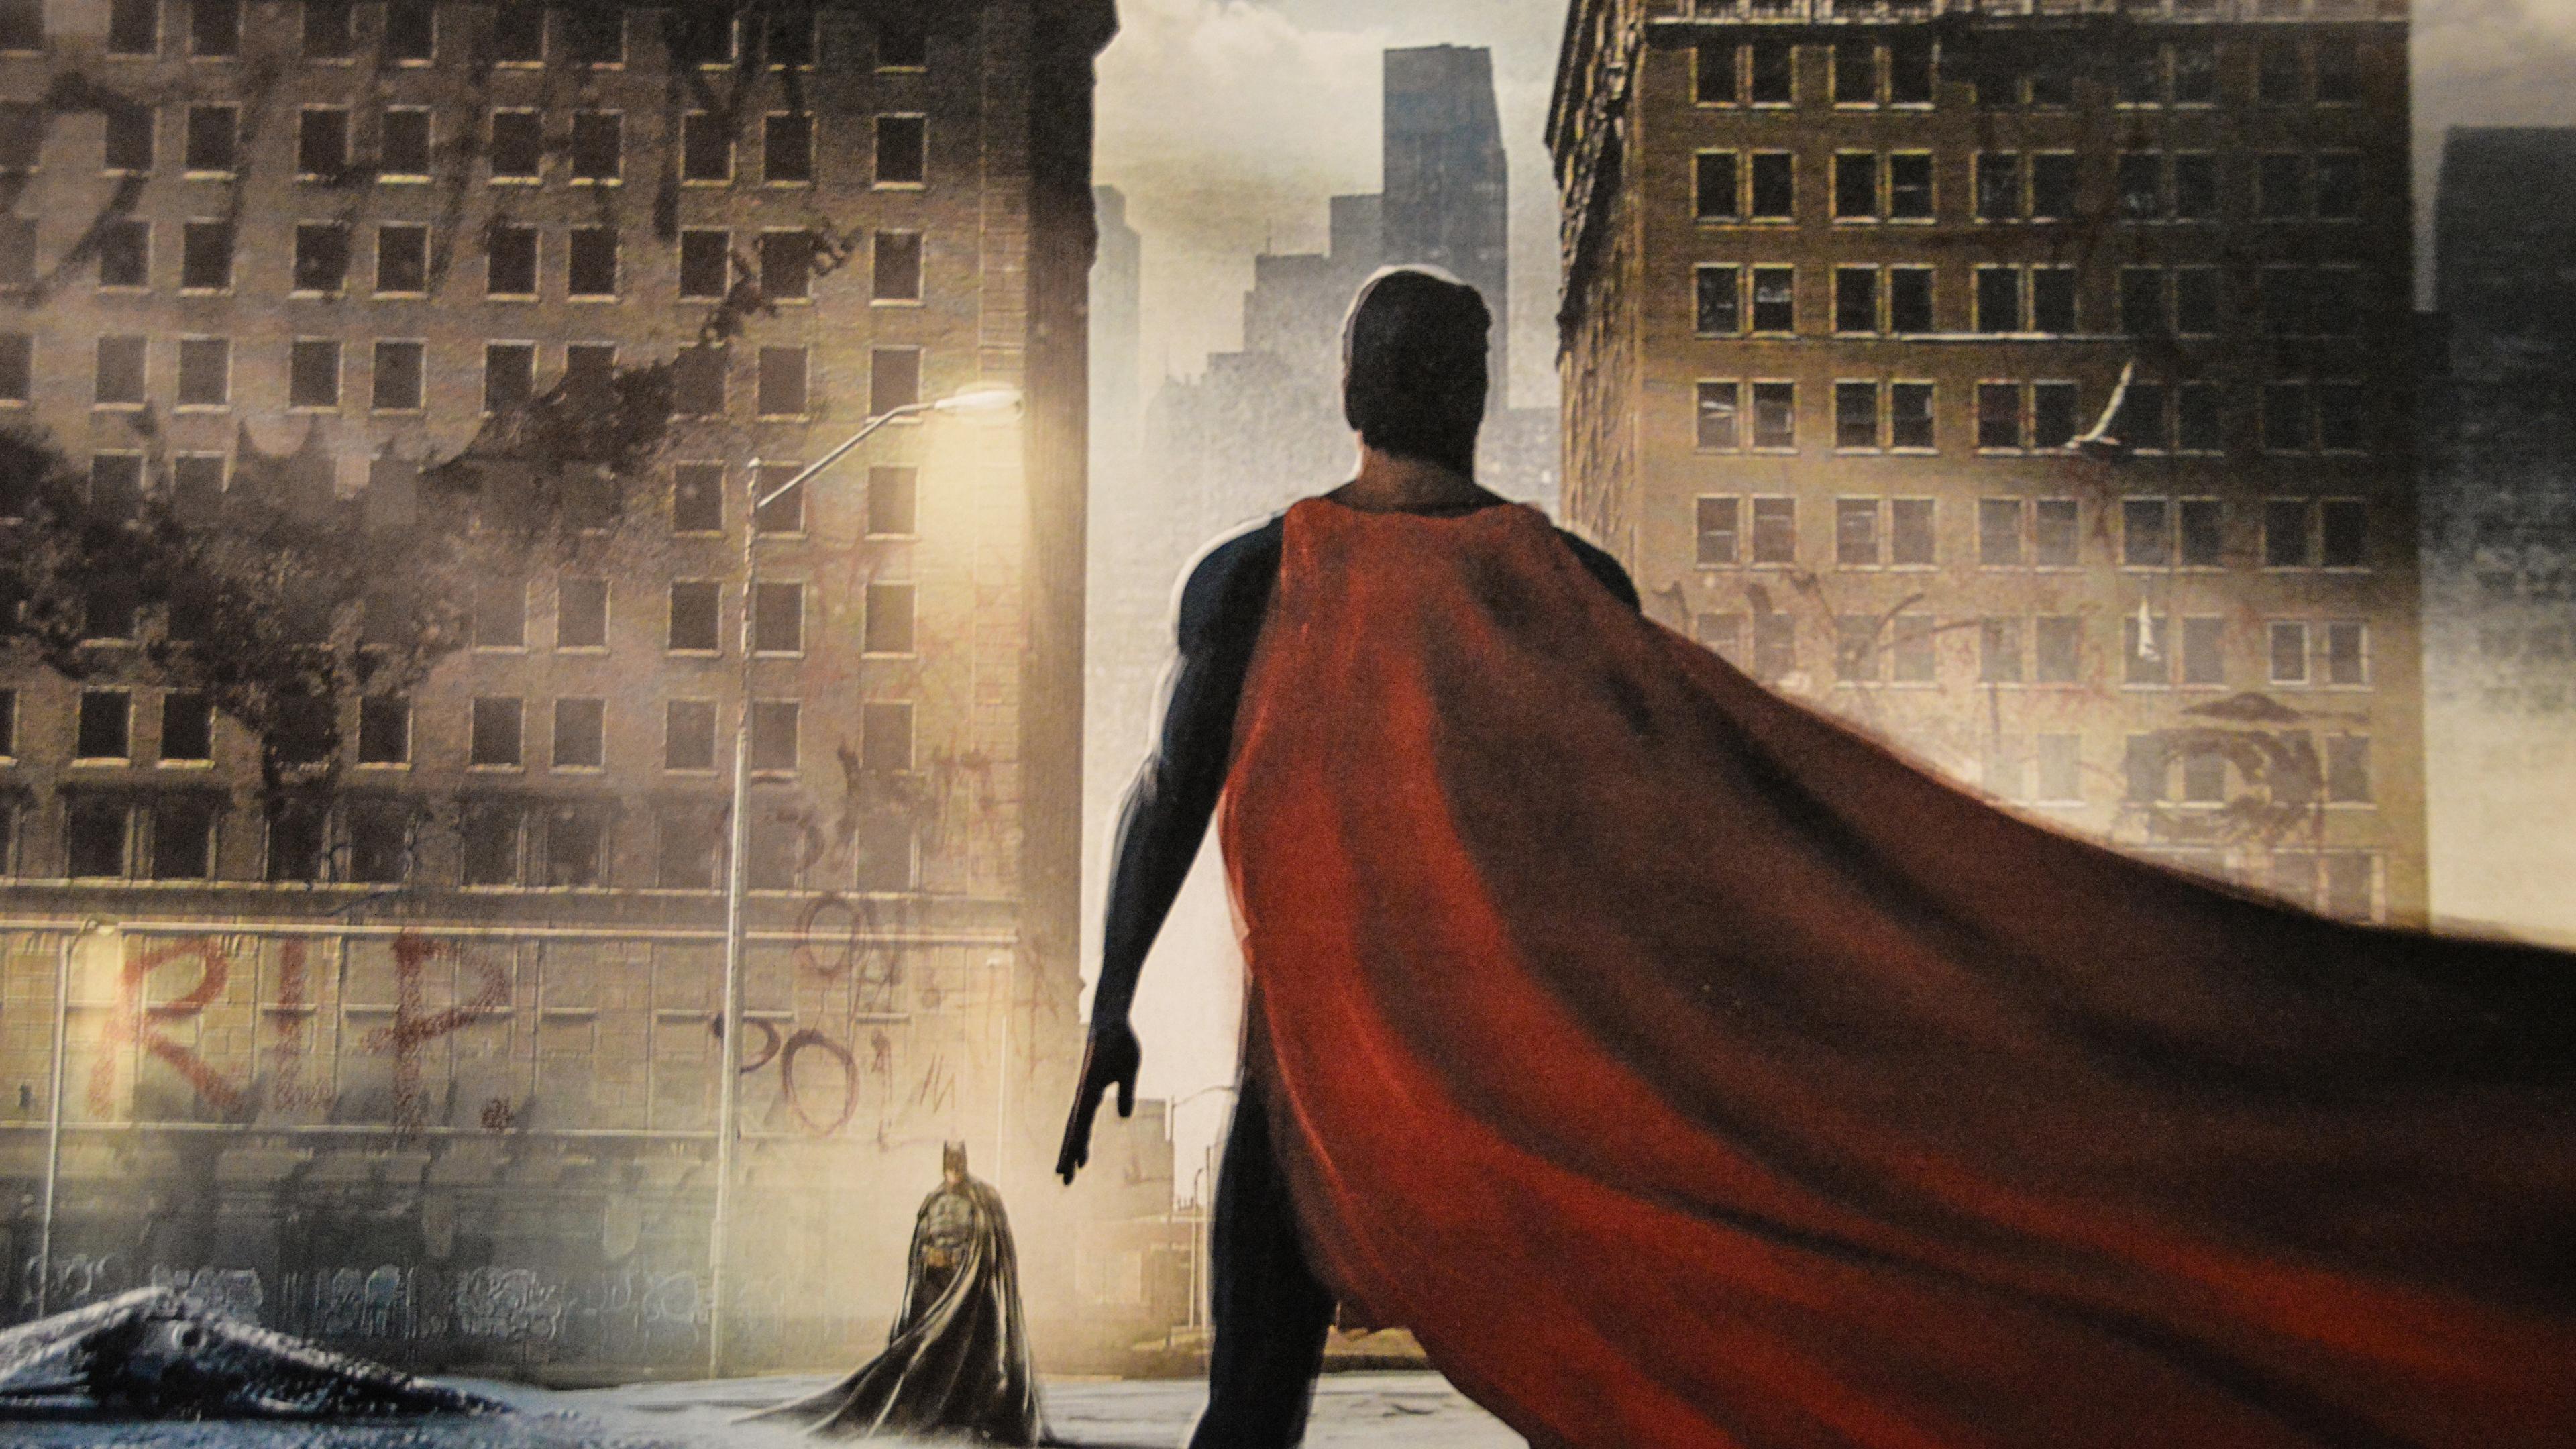 batman vs superman painting 5k 1537646042 - Batman Vs Superman Painting 5k - superman wallpapers, superheroes wallpapers, painting wallpapers, hd-wallpapers, batman wallpapers, 5k wallpapers, 4k-wallpapers